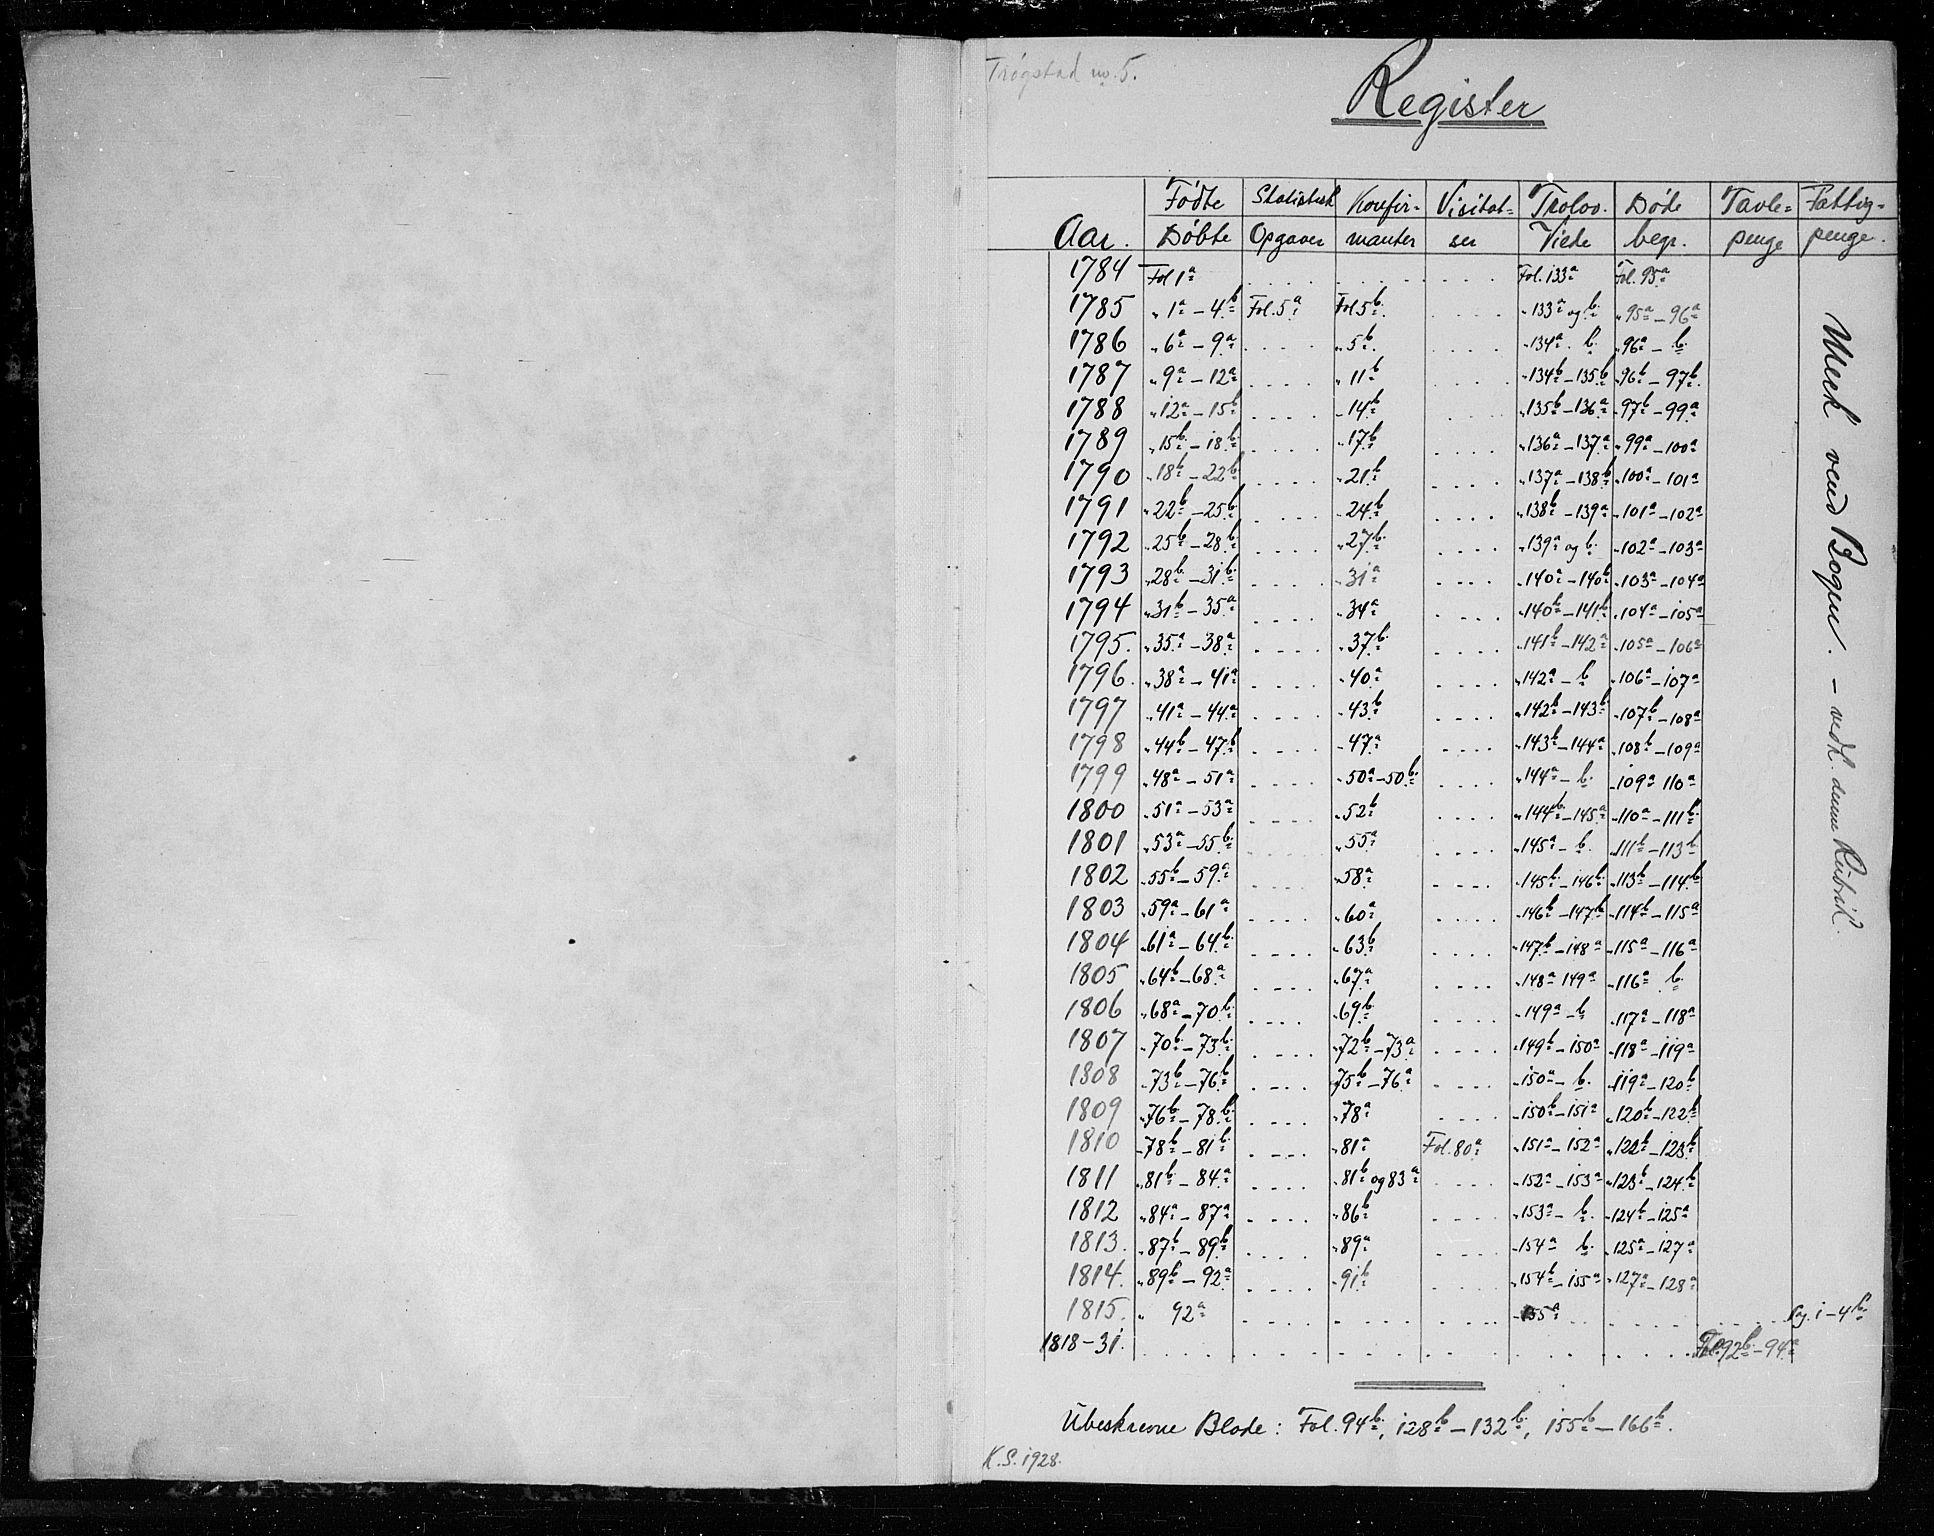 SAO, Trøgstad prestekontor Kirkebøker, F/Fa/L0005: Ministerialbok nr. I 5, 1784-1814